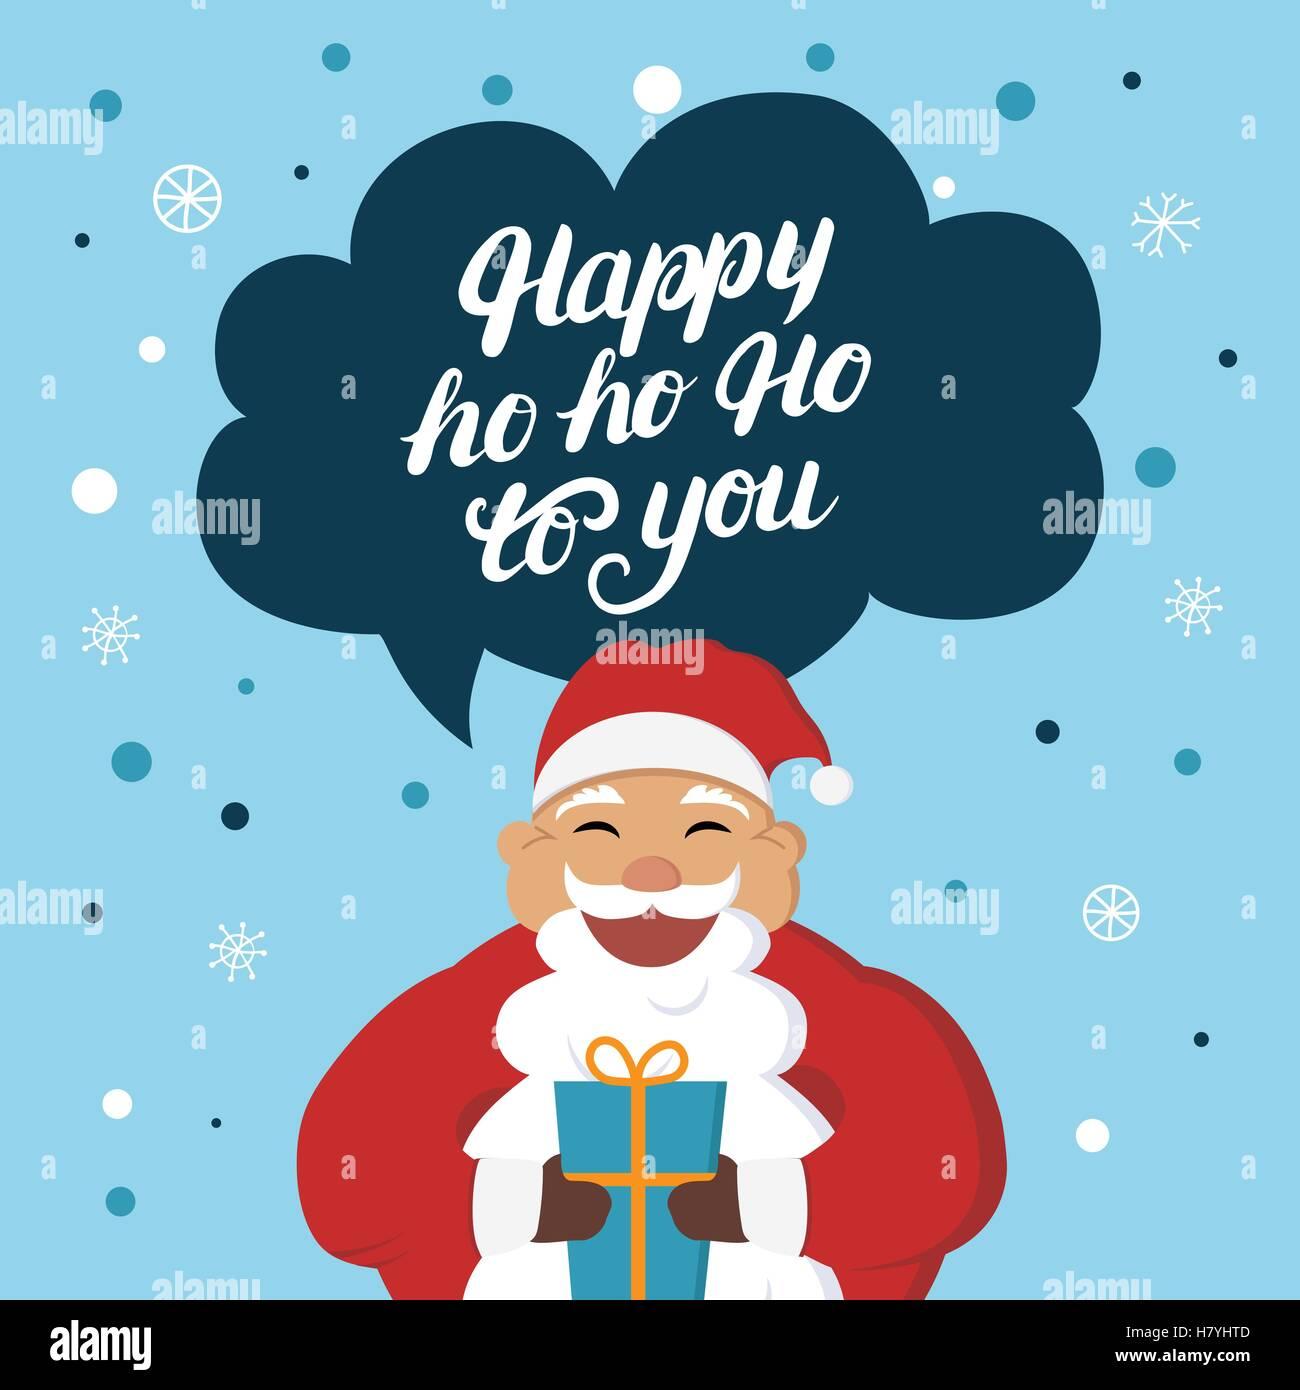 Babbo Natale Ho Ho Ho.Divertente Babbo Natale Con Dono Dire Hoho Felice Per Te Carino